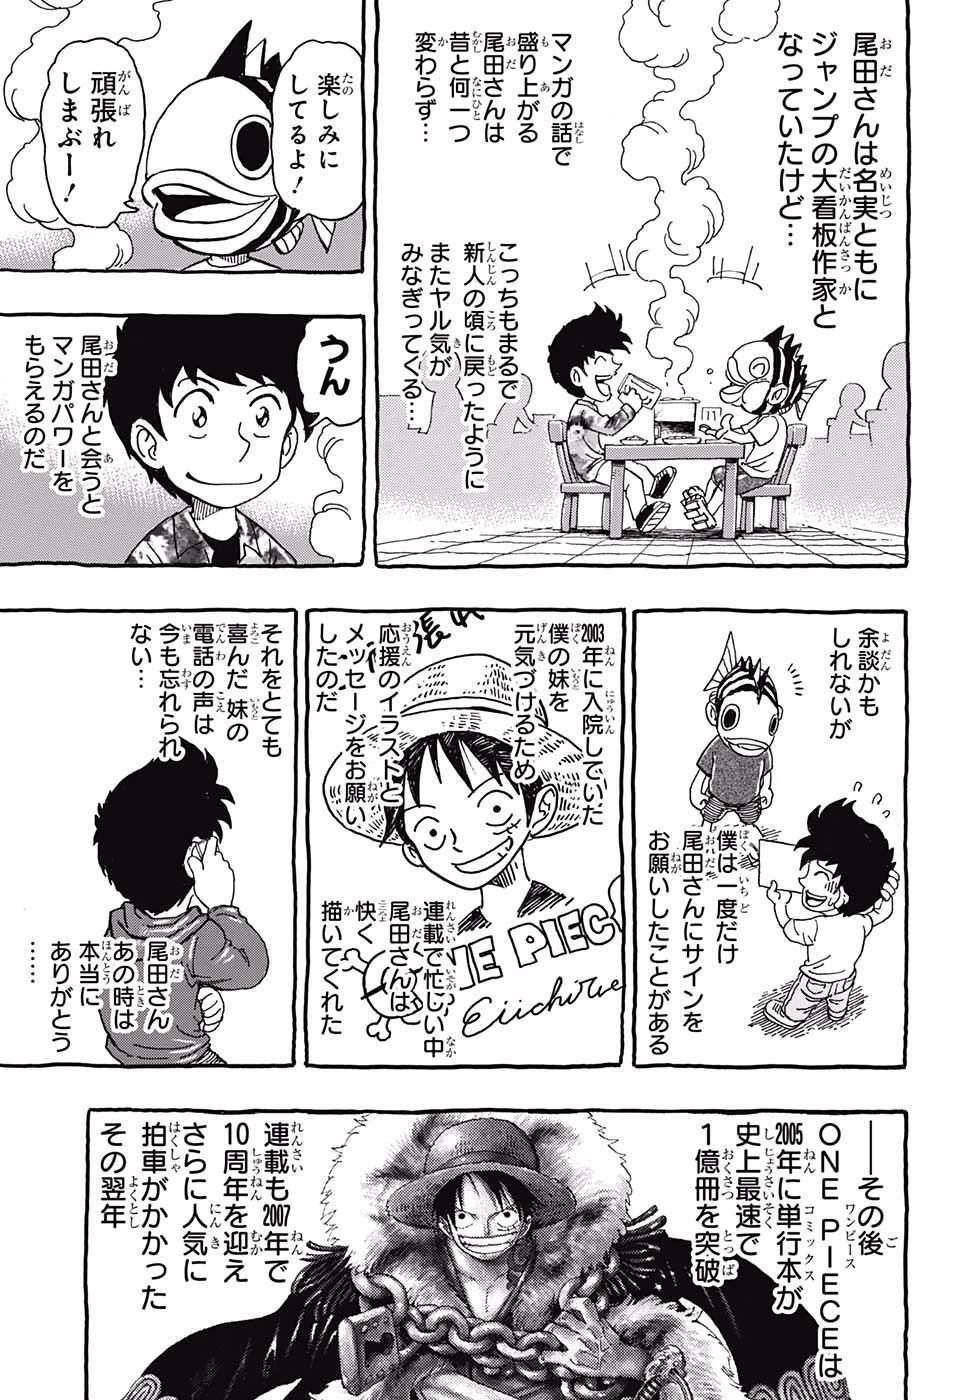 One Piece Manga 2017 X7FGEroG